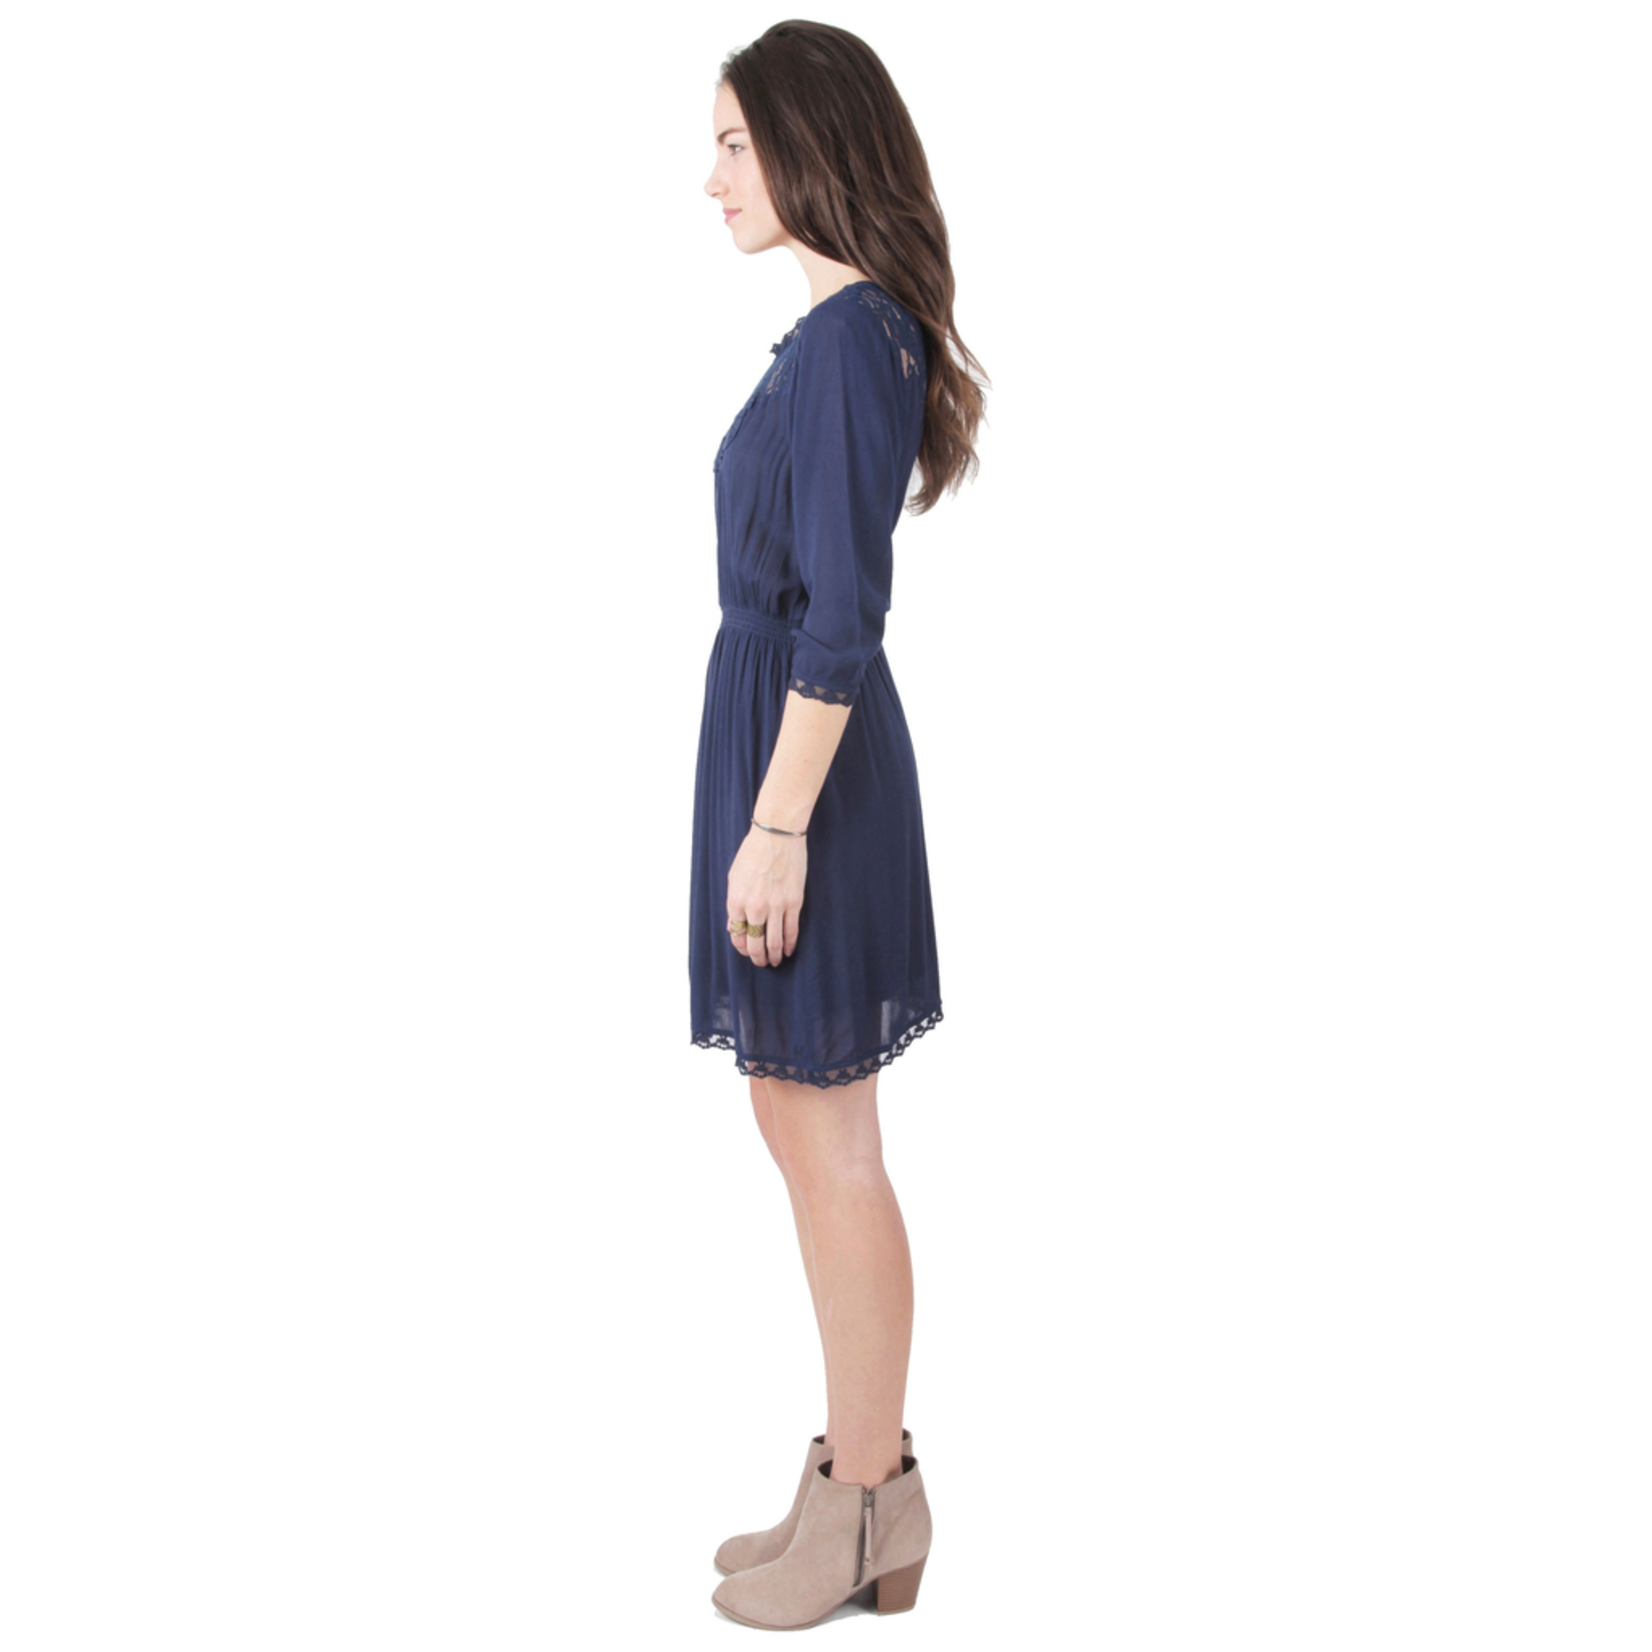 Gentle Fawn Gentle Fawn Dutchess Dress, sale item, Was $100